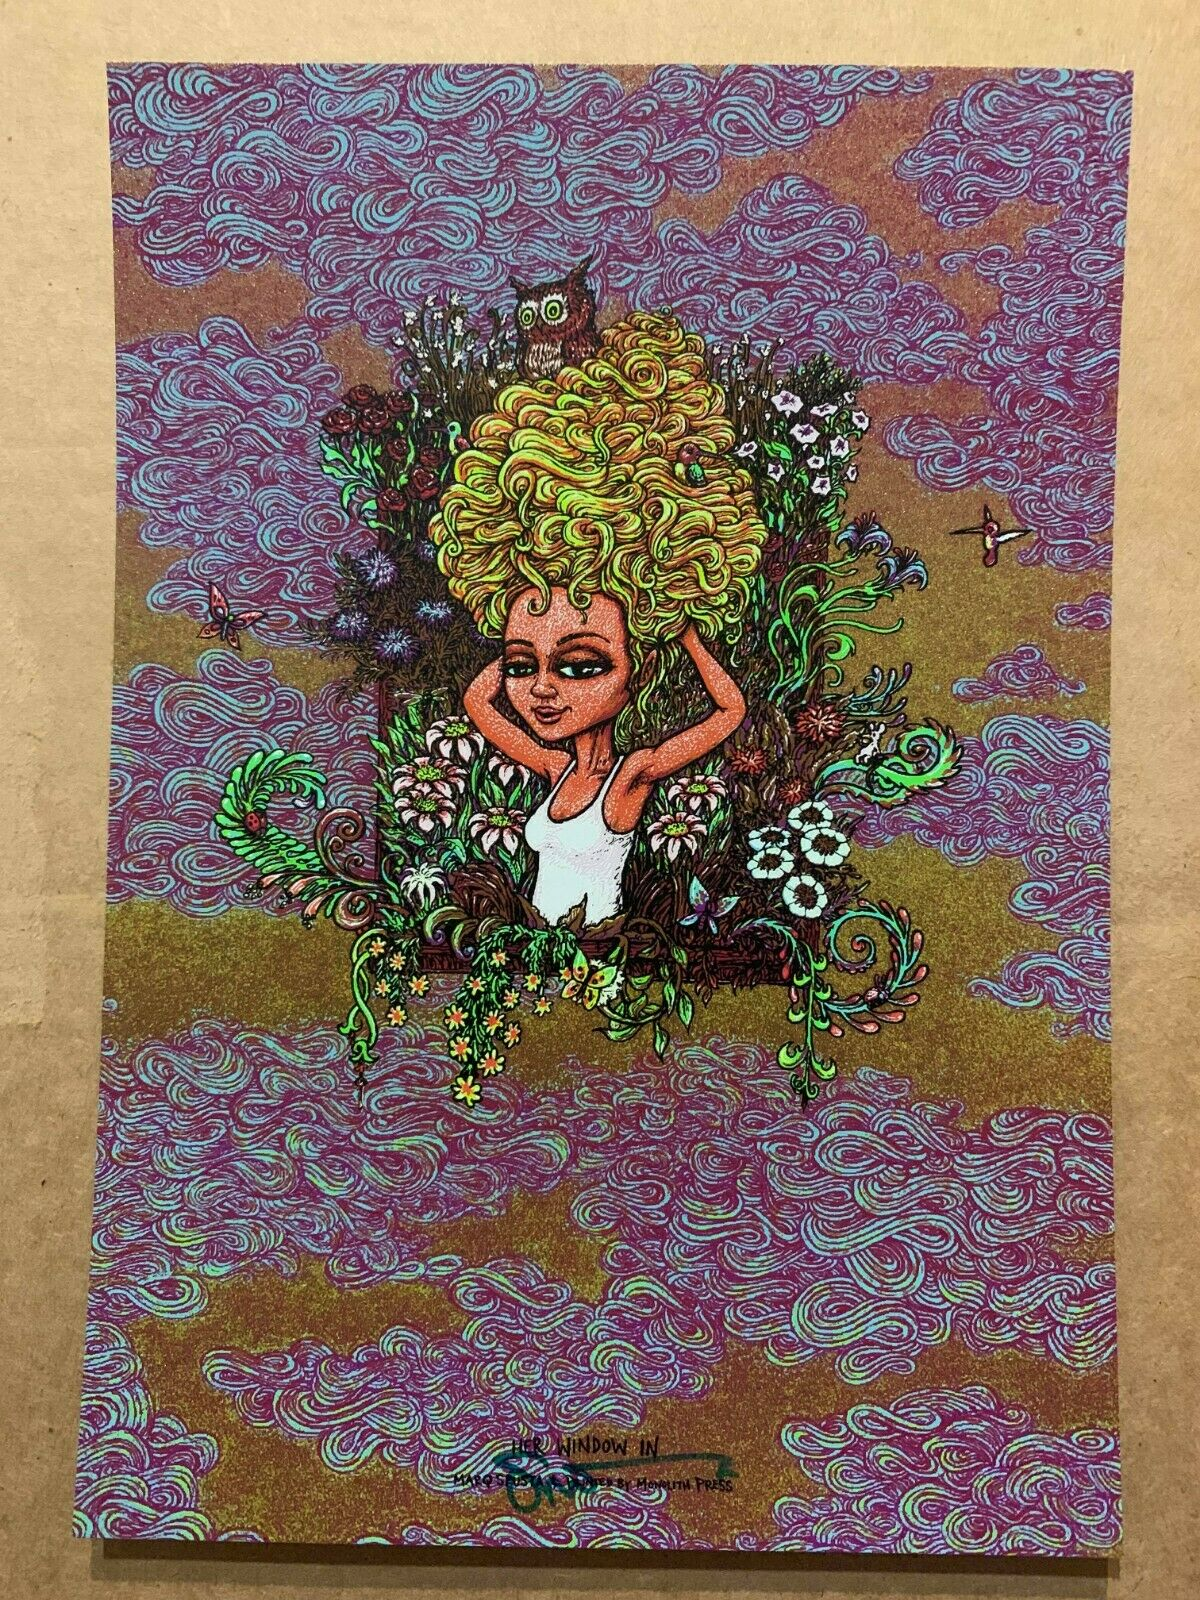 SIGNED Marq Spusta Her Window In Art print poster shimmer dark blue gold limited